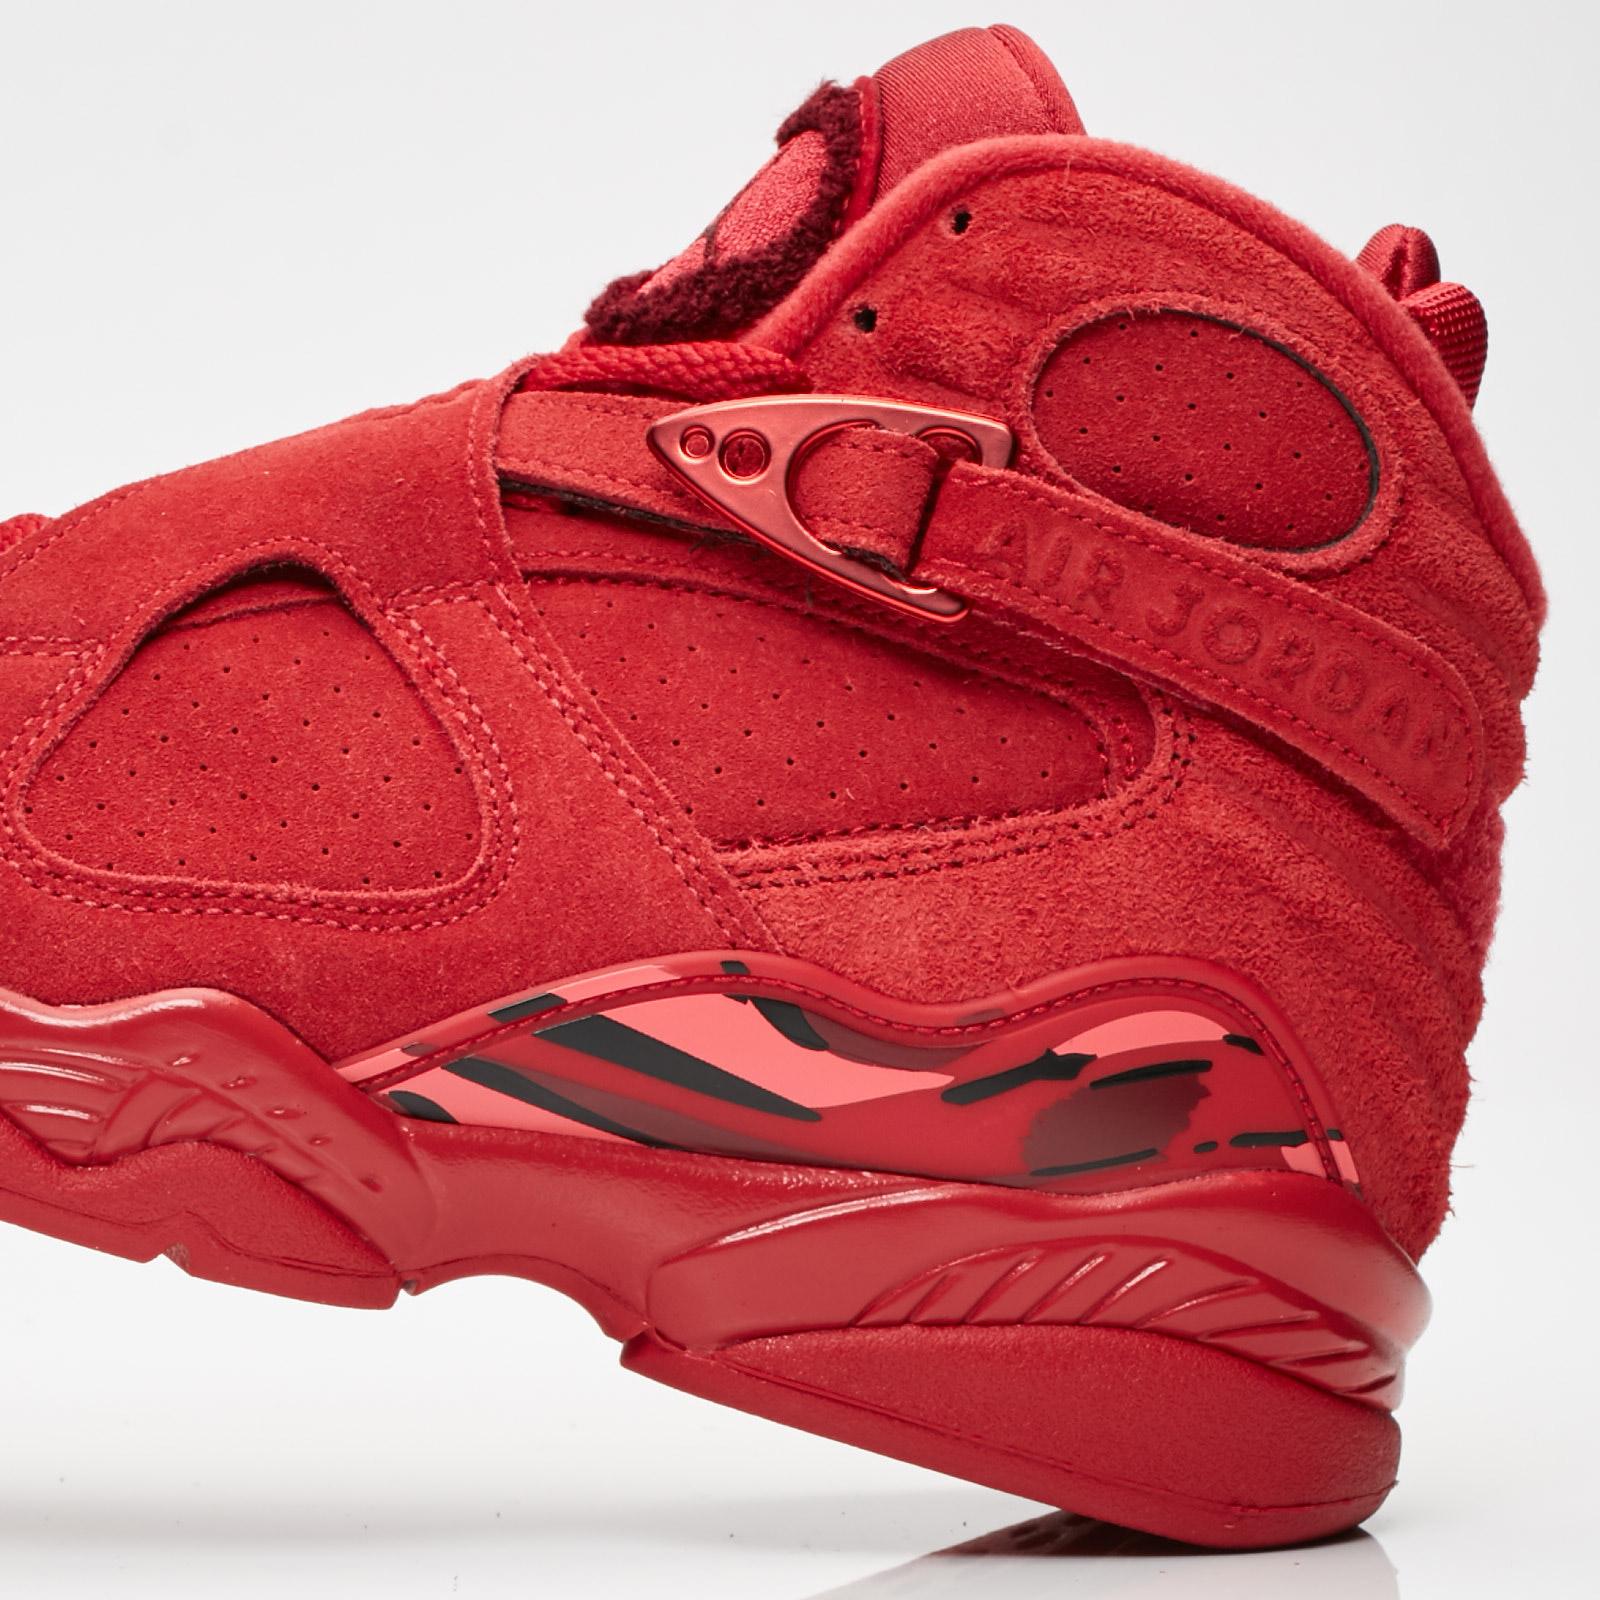 sale retailer 10647 00e70 Jordan Brand Wmns Air Jordan 8 Retro Valentines Day - Aq2449 ...